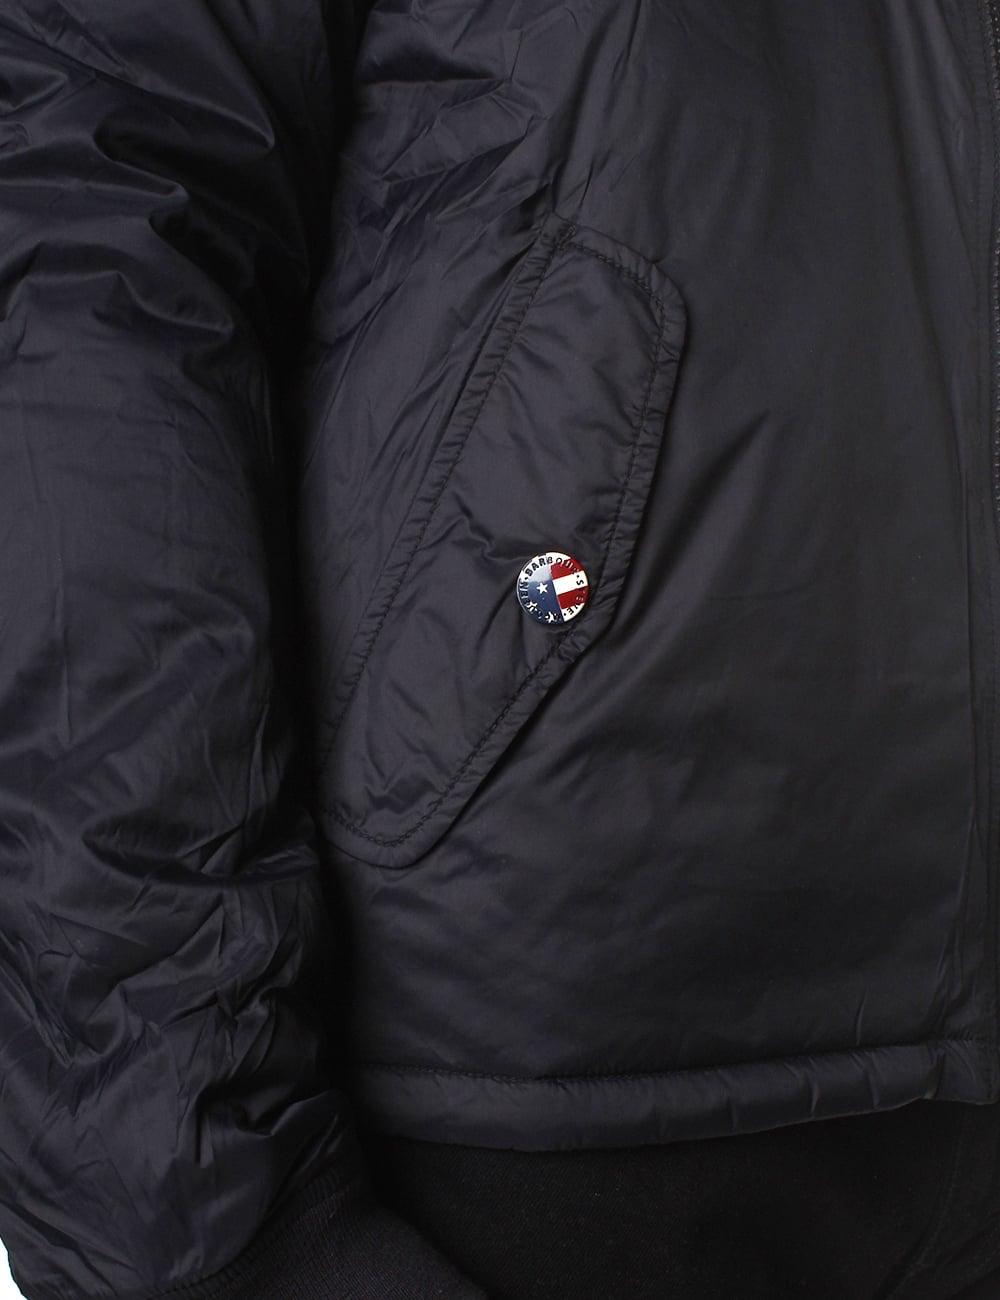 4829f6f9d Barbour Steve McQueen Oil Field Men's Quilted Jacket